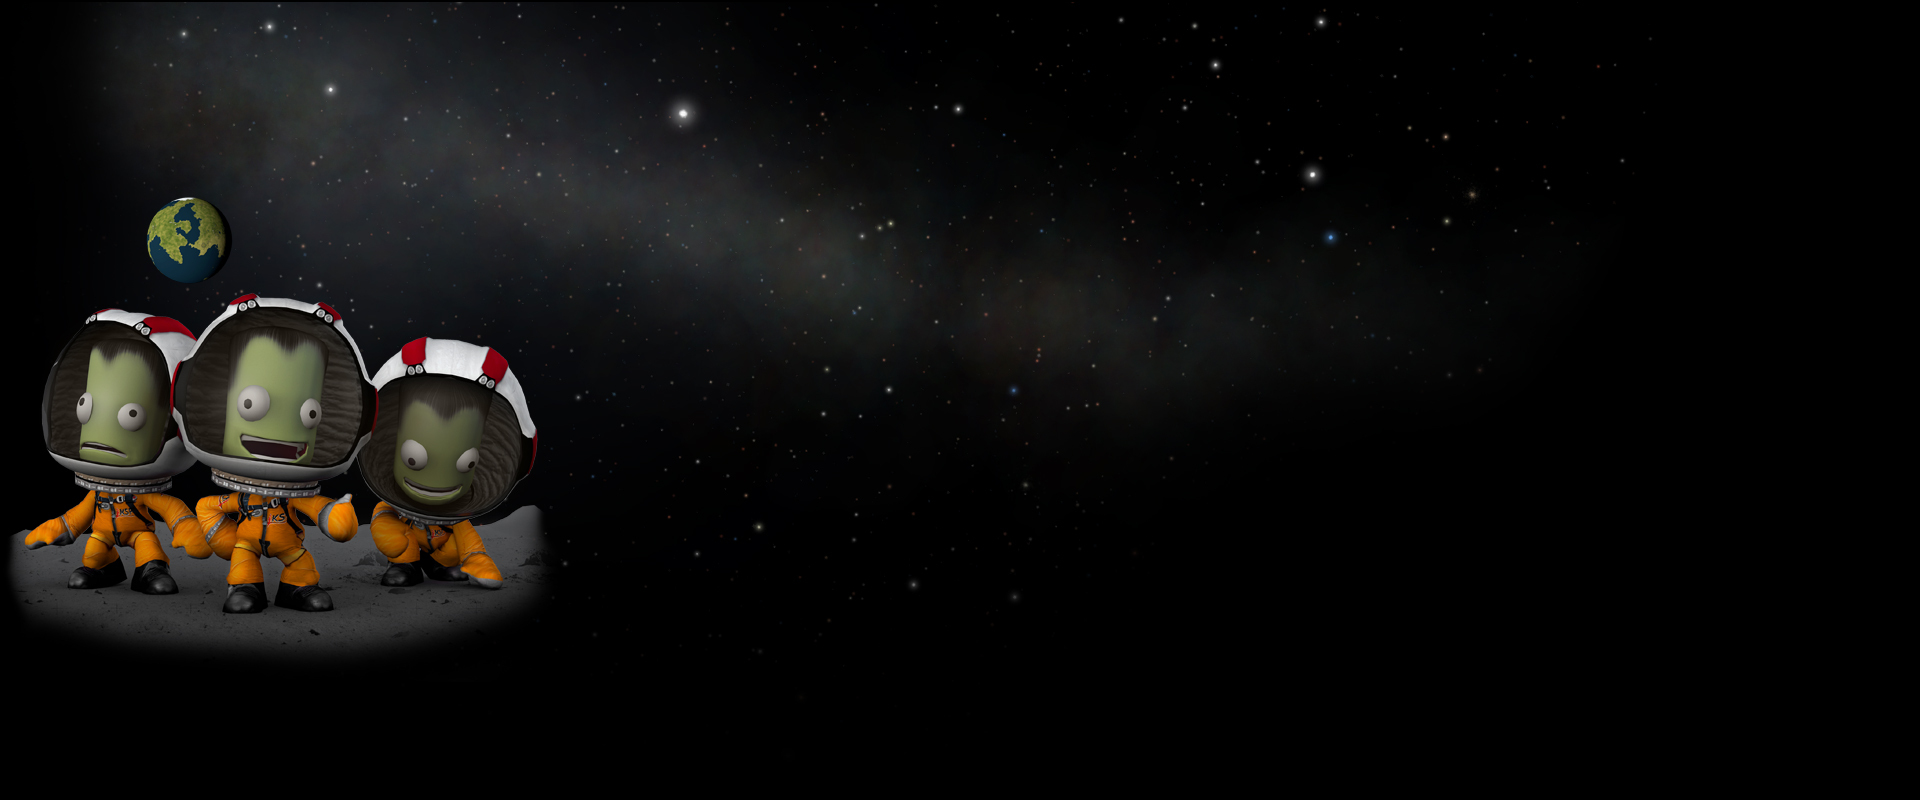 Kerbal Space Program Fondo De Pantalla And Fondo De